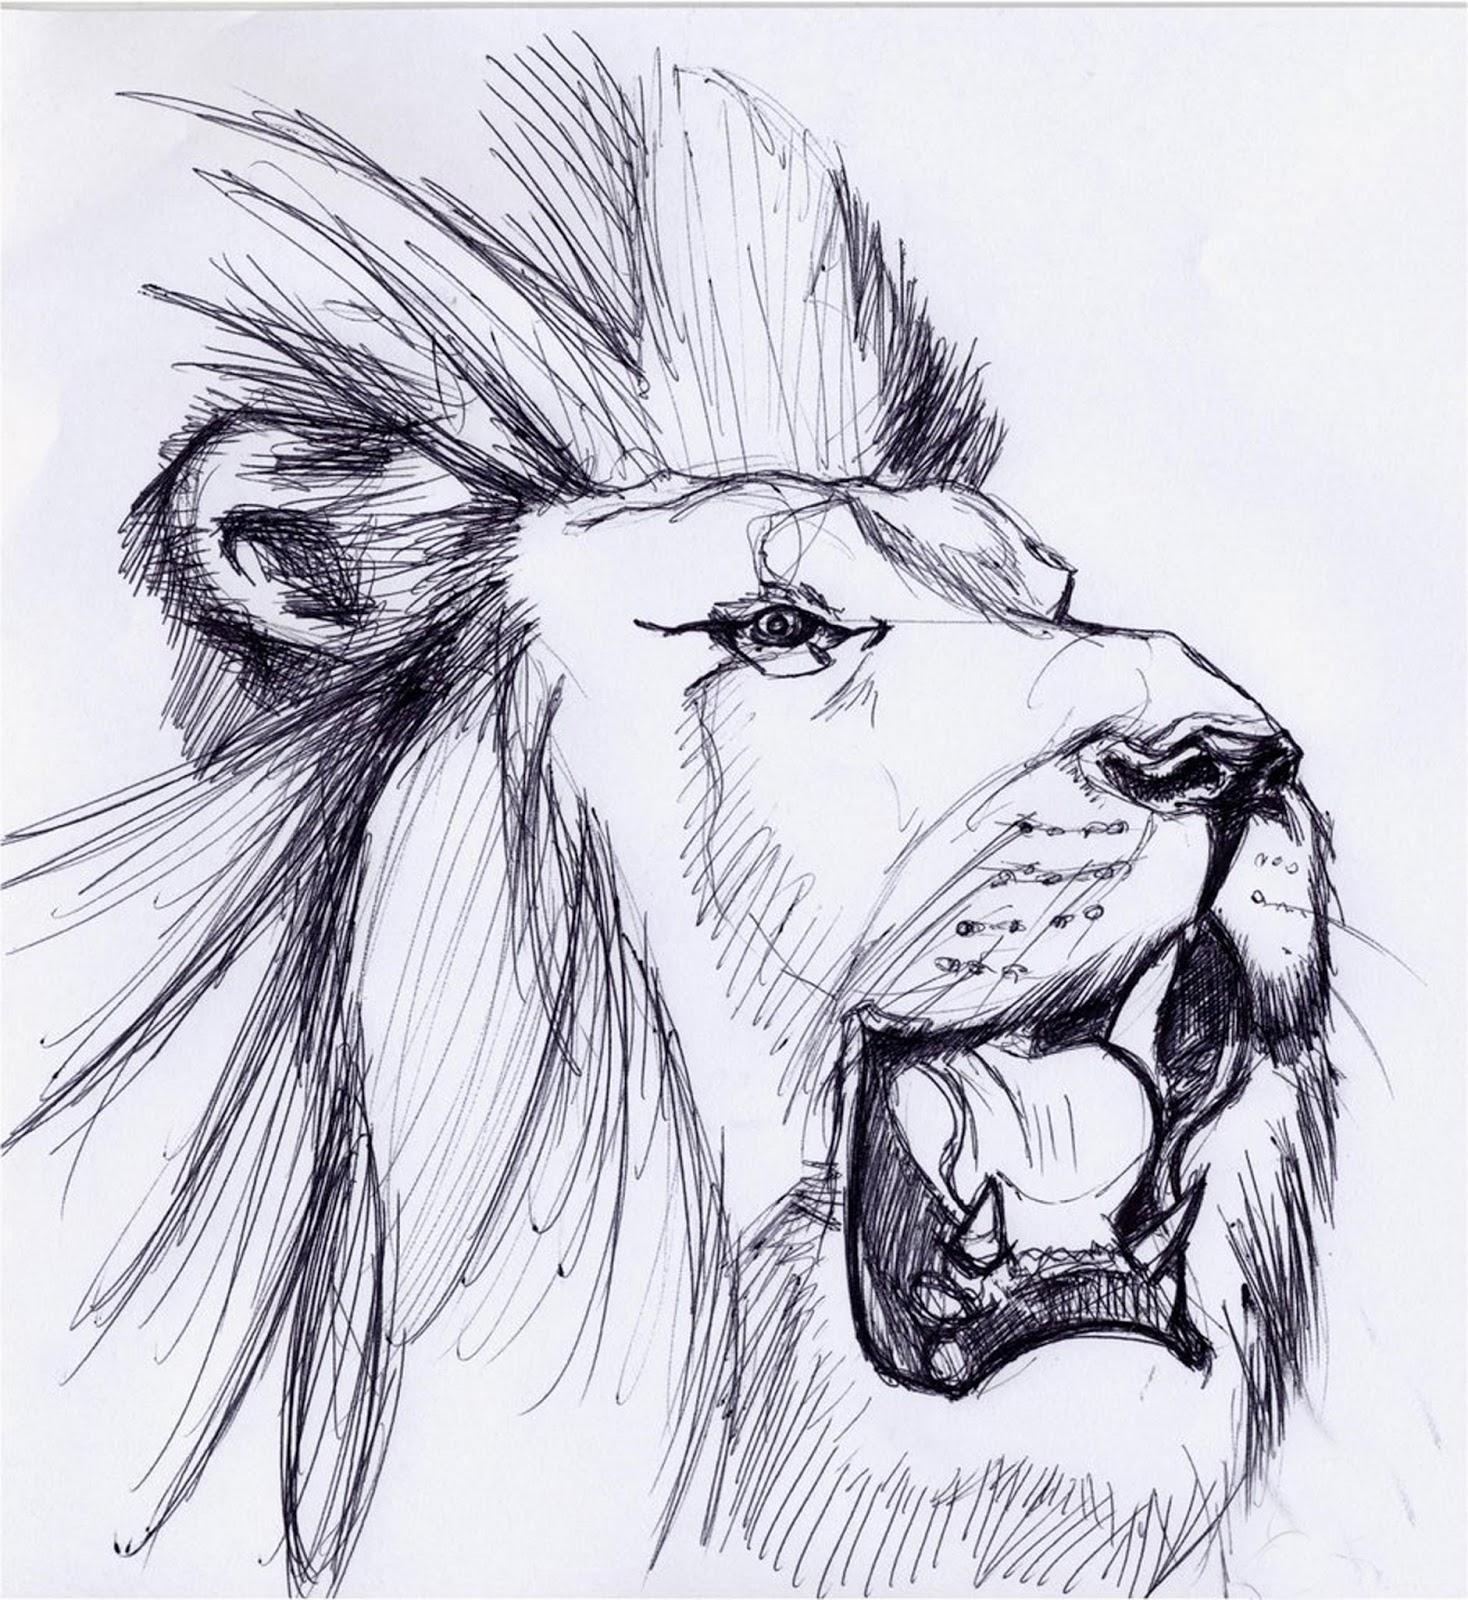 Roaring Lion Profile Tattoo Nolga Suzanne